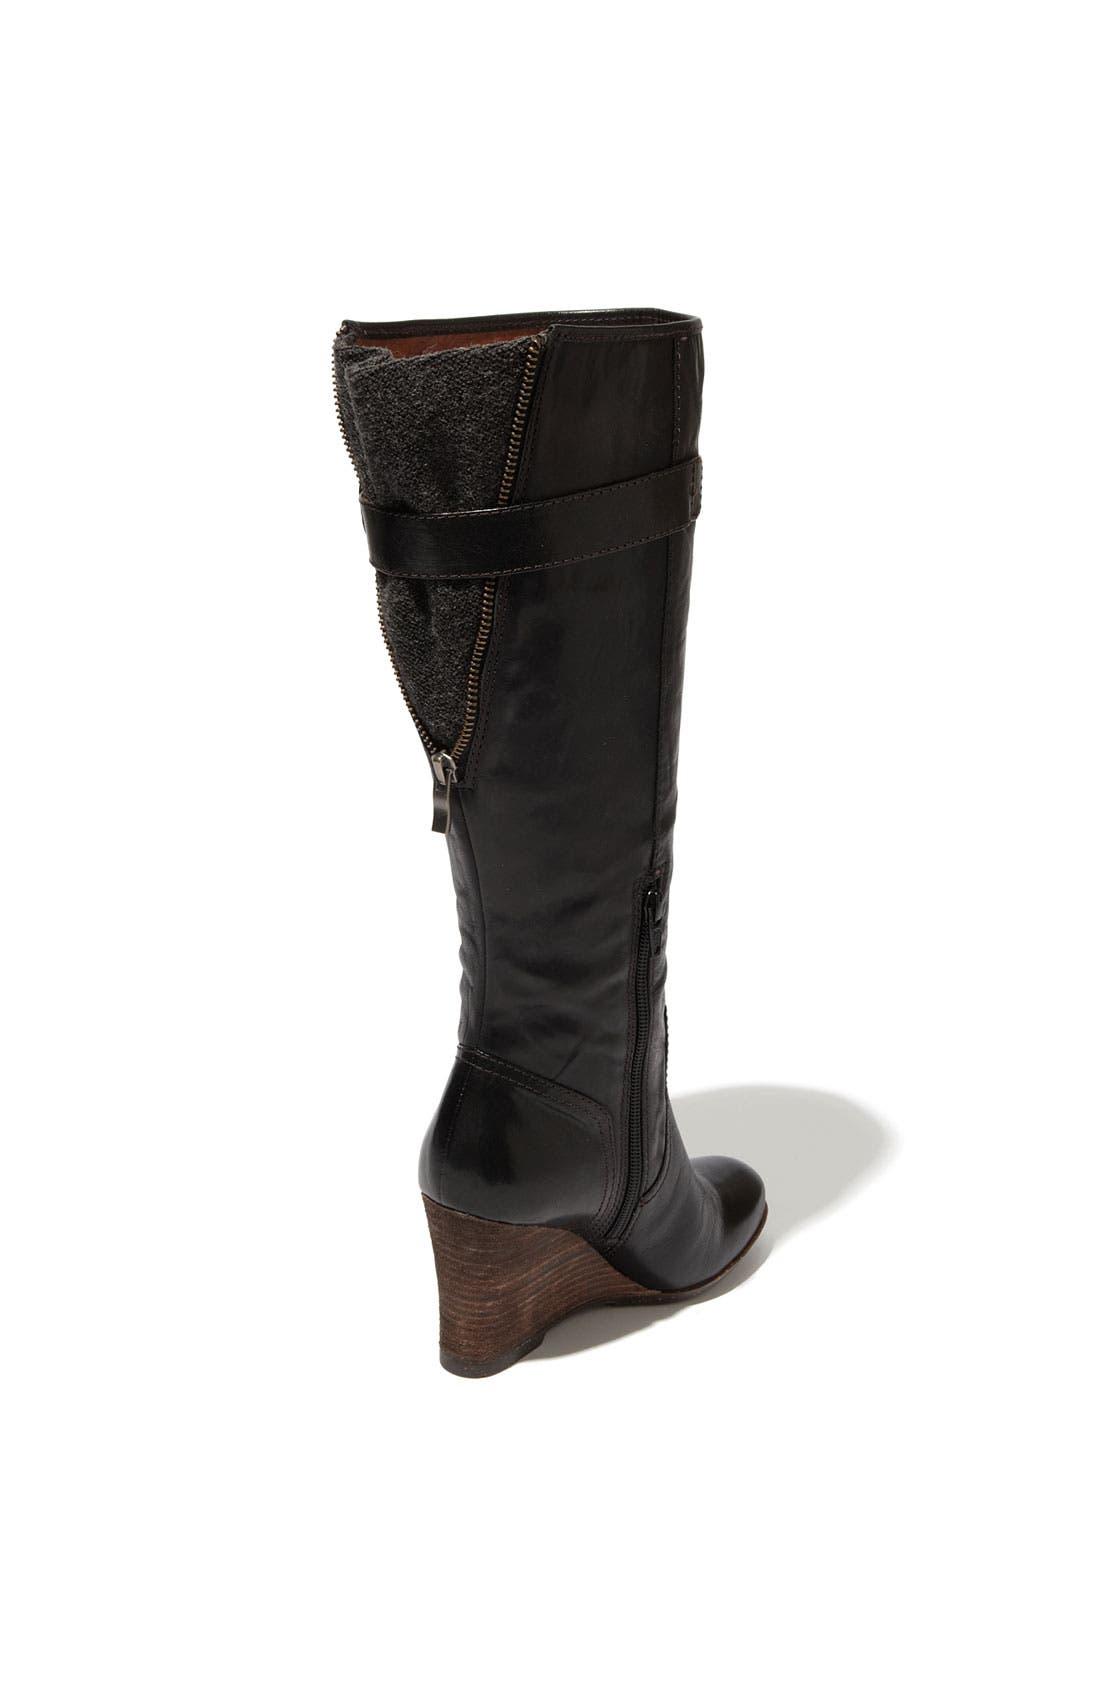 NAYA,                             'Quail' Boot,                             Alternate thumbnail 2, color,                             001